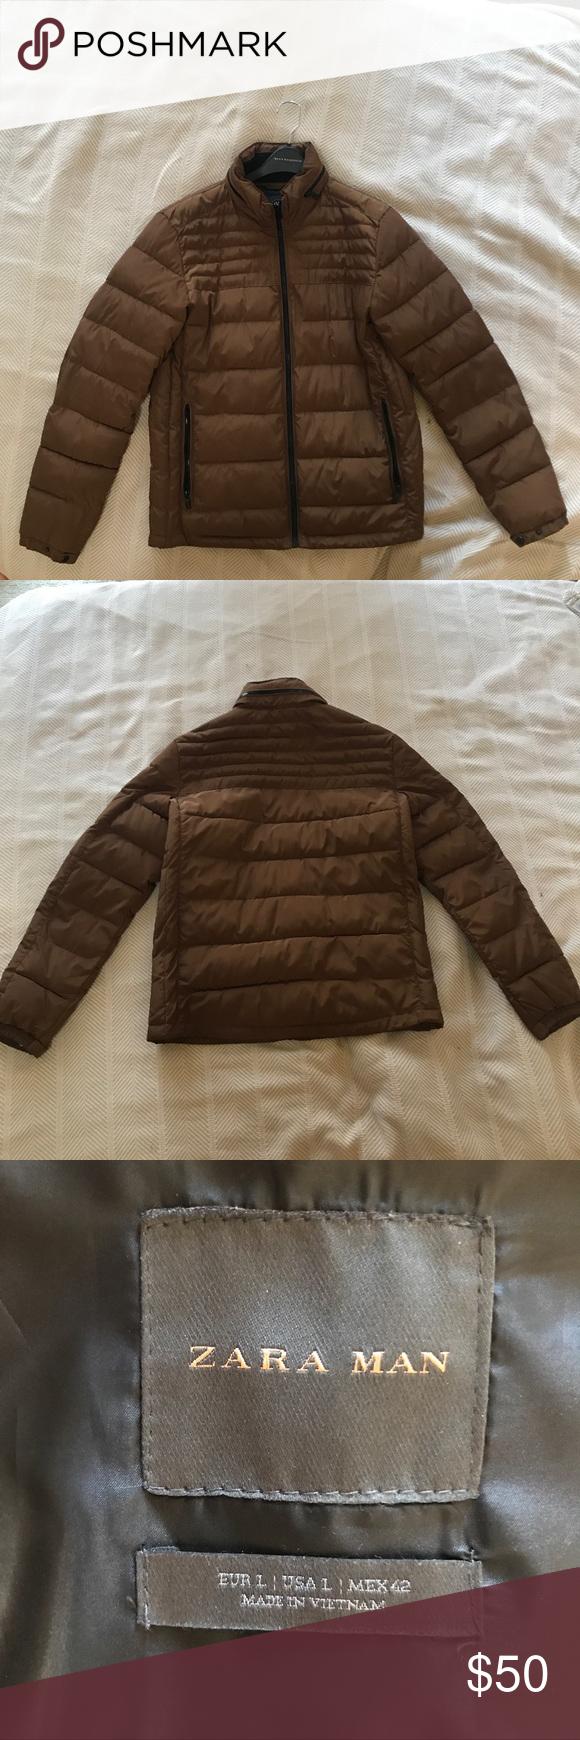 Zara Men S Brown Puffer Jacket Clothes Design Zara Zara Man [ 1740 x 580 Pixel ]